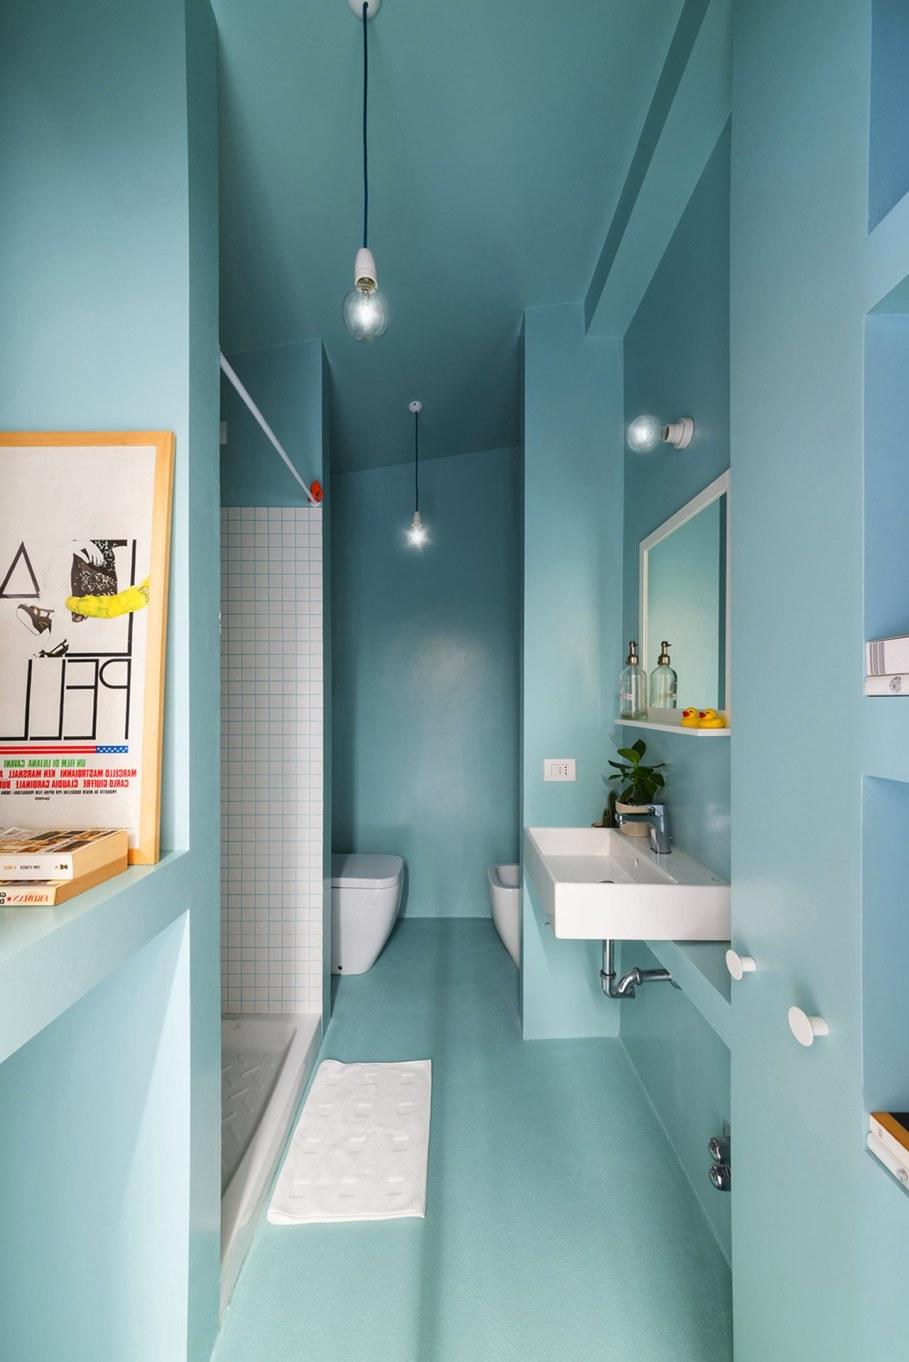 OCS Batipin Flat Transformer Apartment In Milan - Bathroom